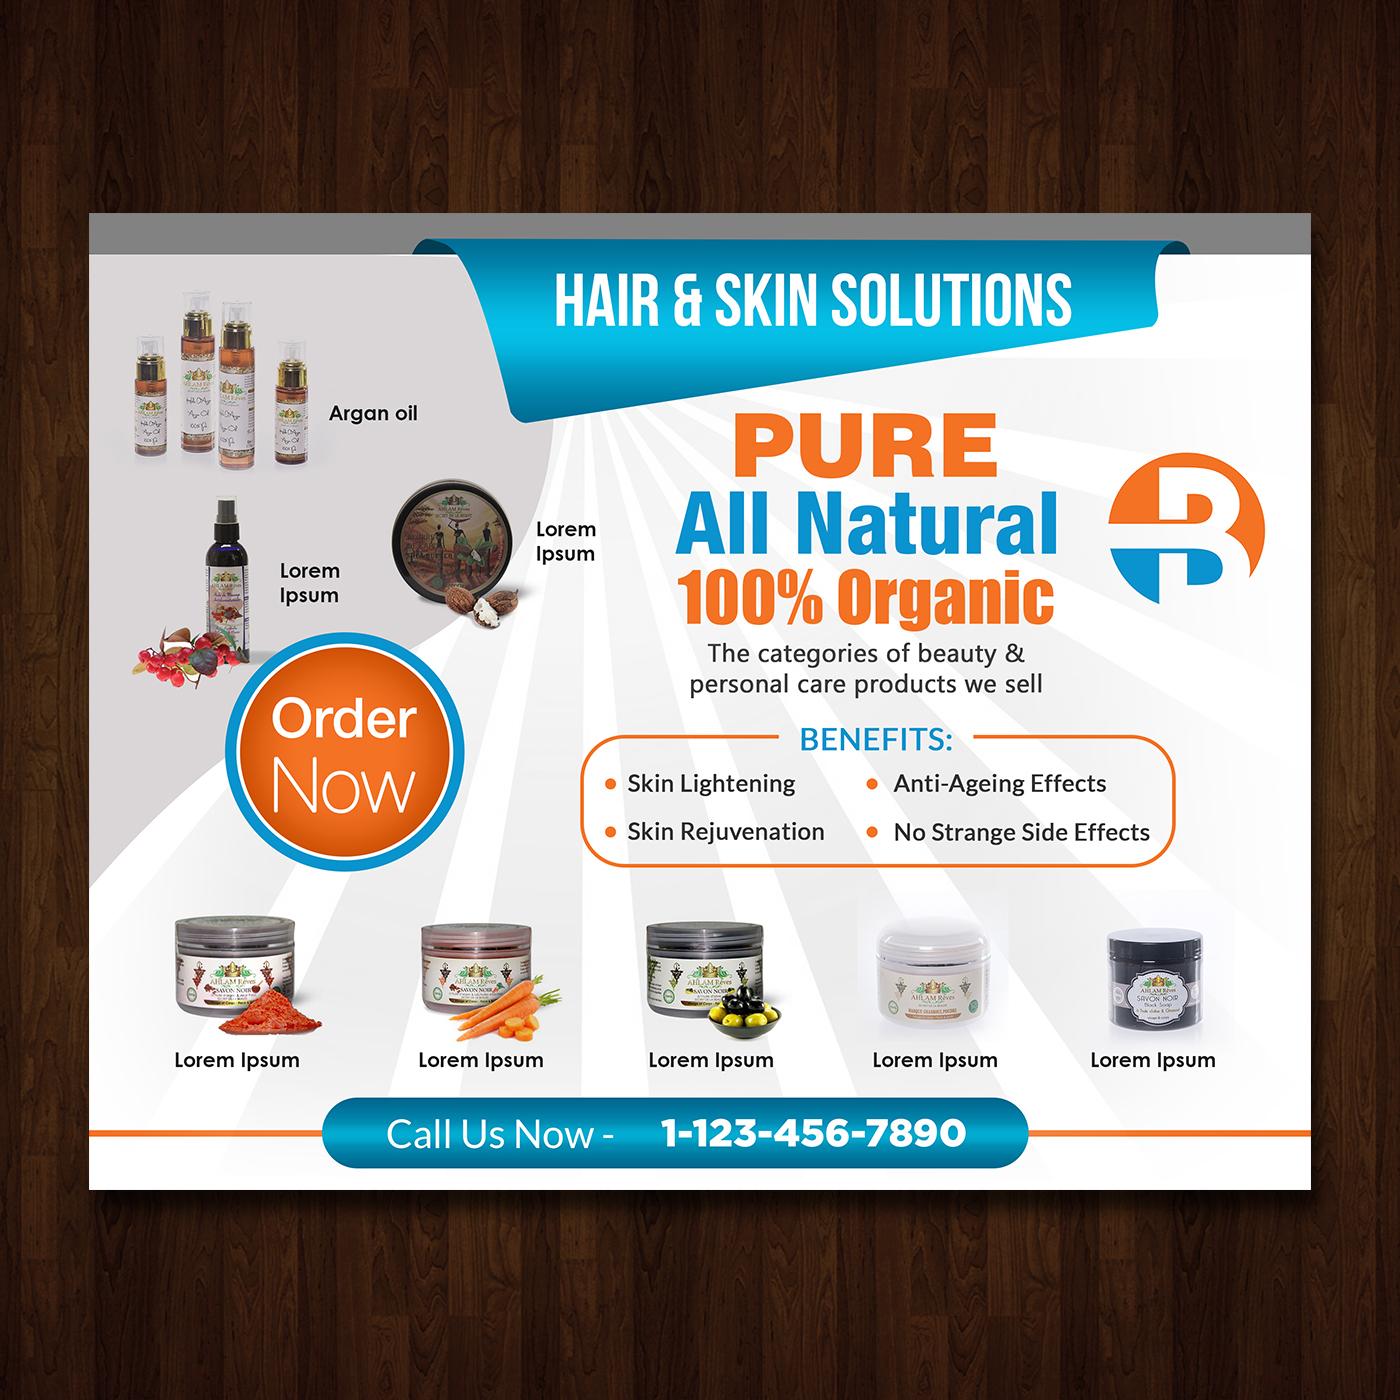 Elegant Feminine Cosmetics Banner Ad Design For A Company By Creative Bugs Design 15536530